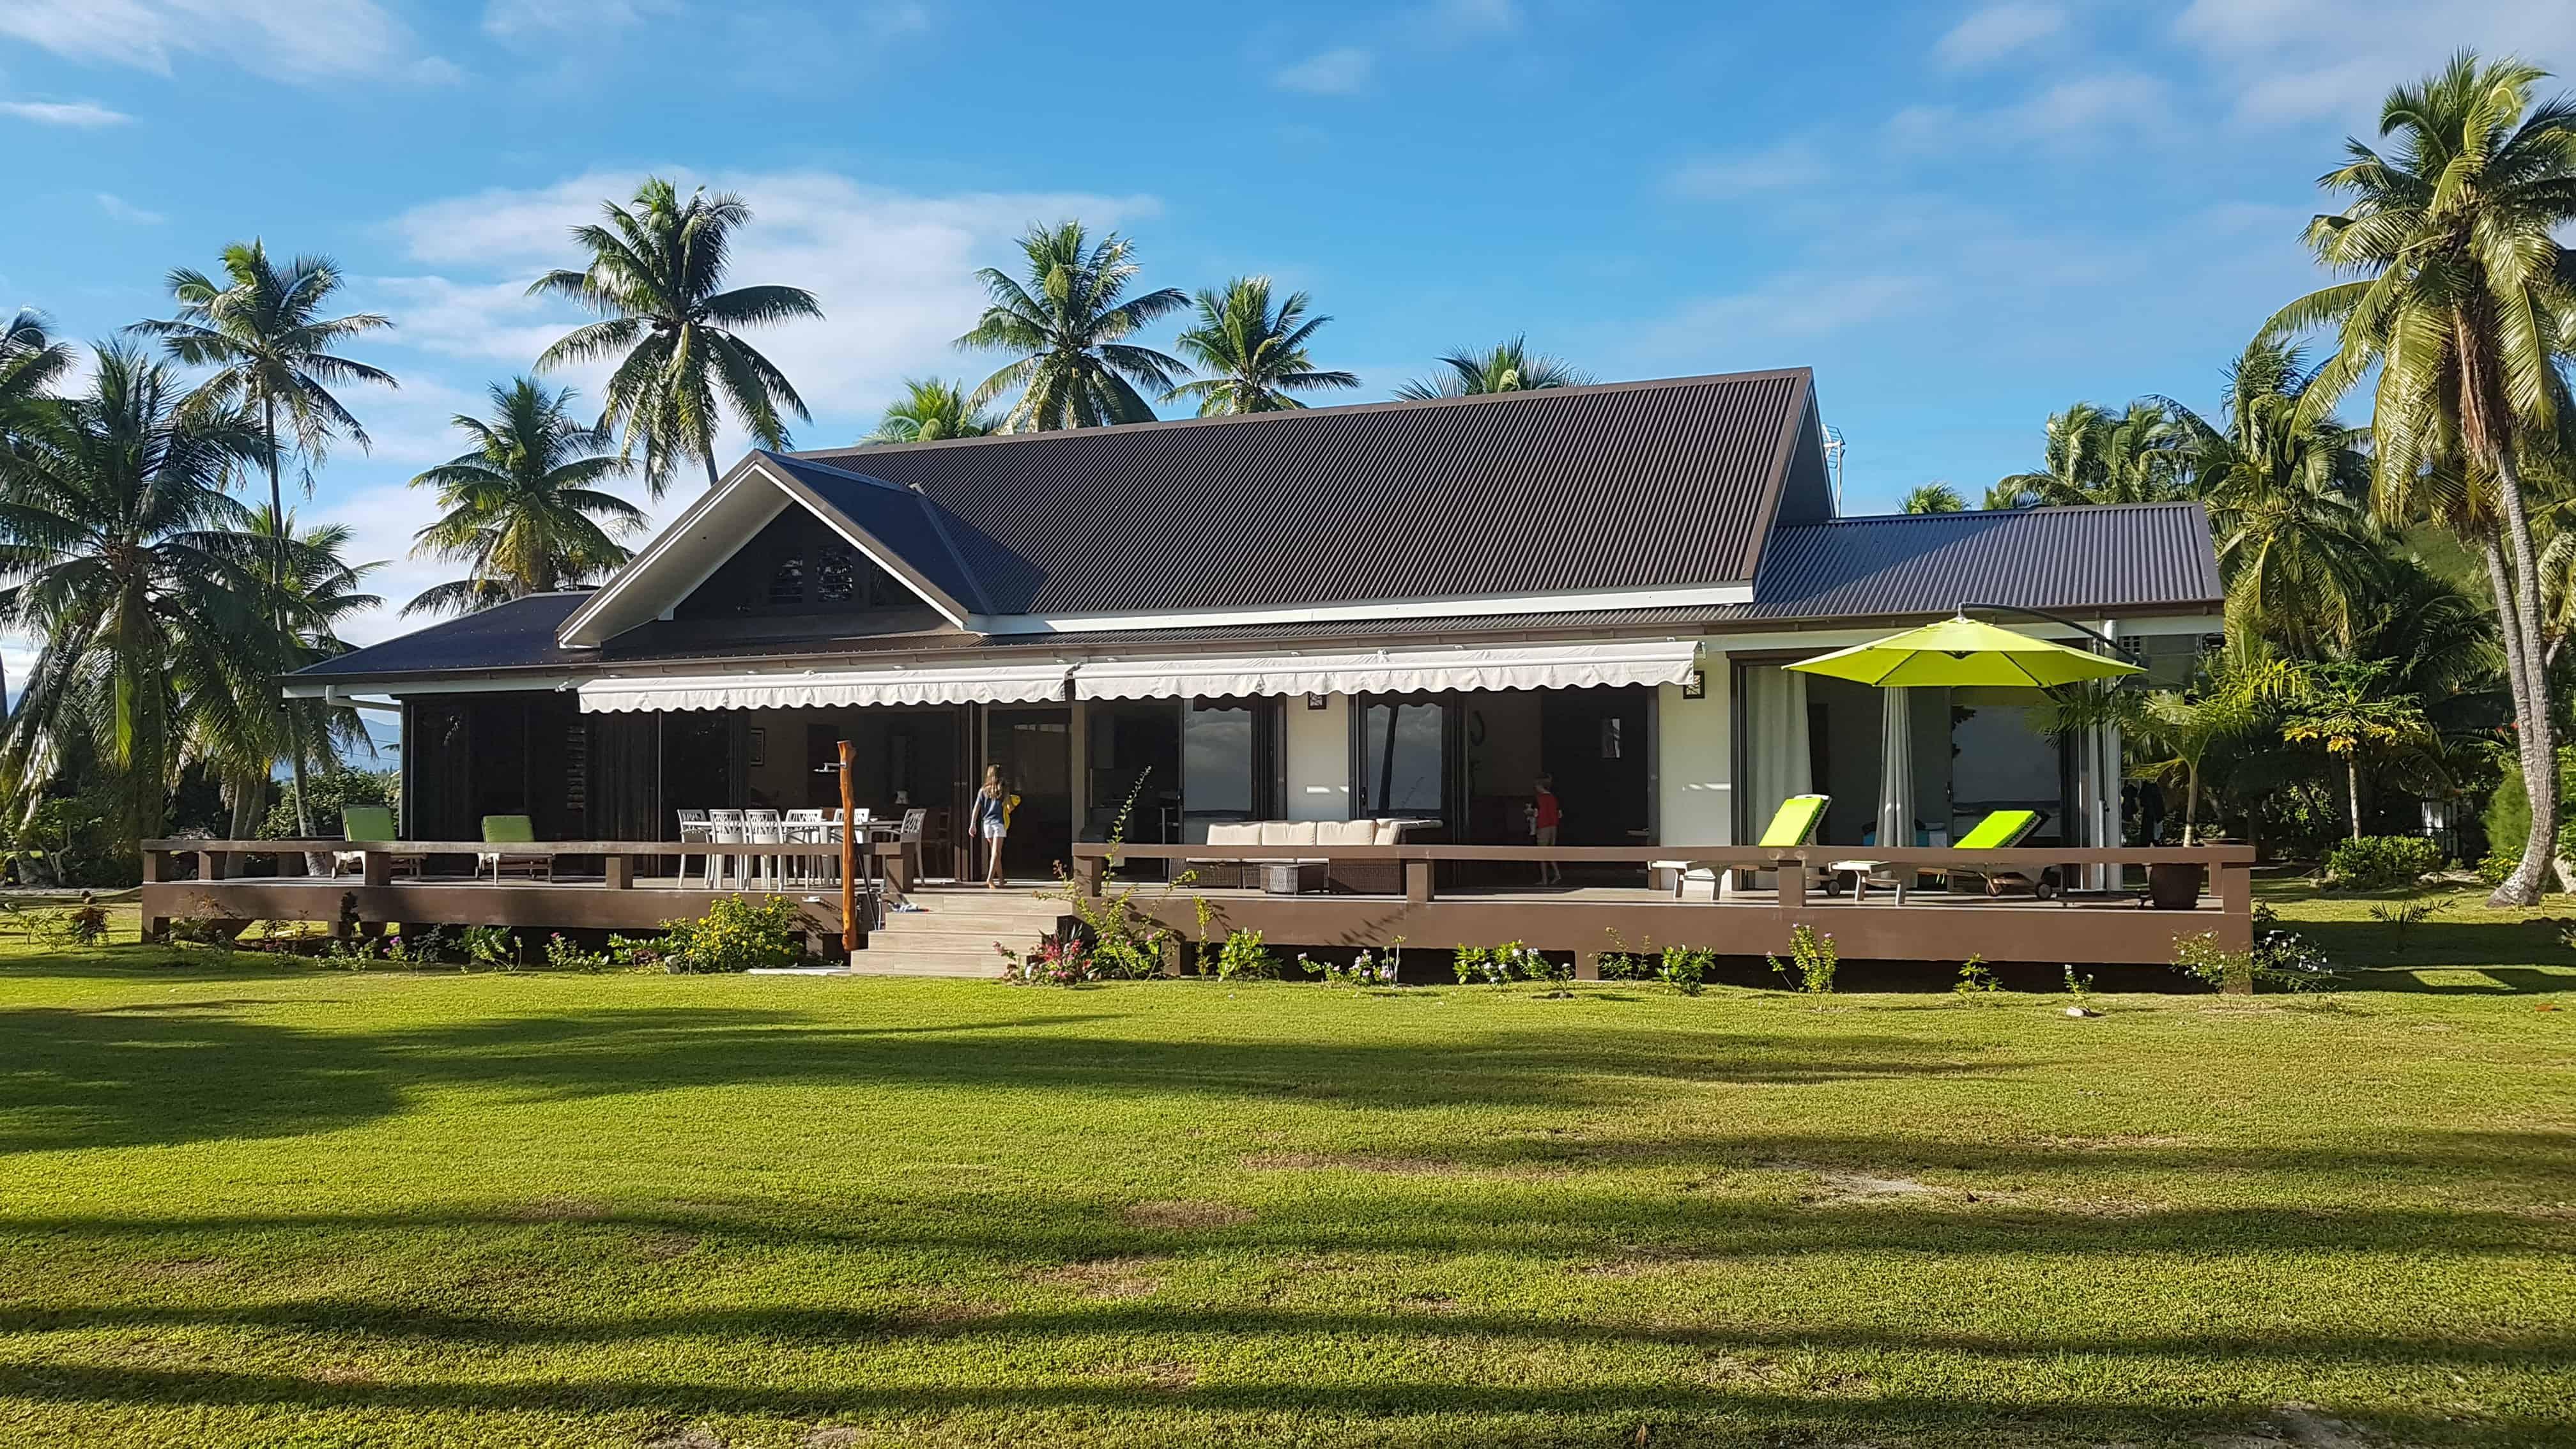 https://tahititourisme.nz/wp-content/uploads/2018/09/Villa-Tiarenui-by-Tahiti-Homes-®-a-Moorea-4.jpg